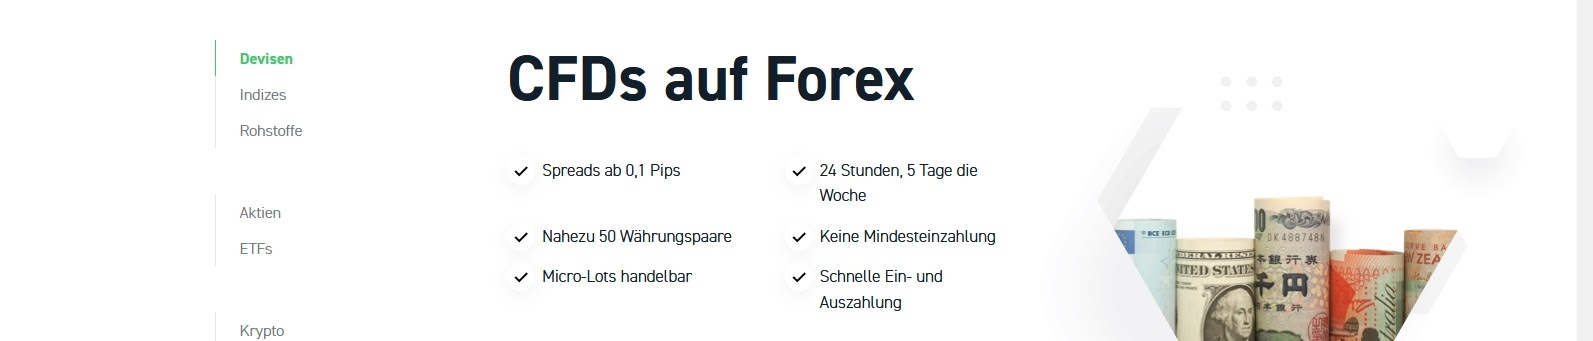 Négociation XTB Forex